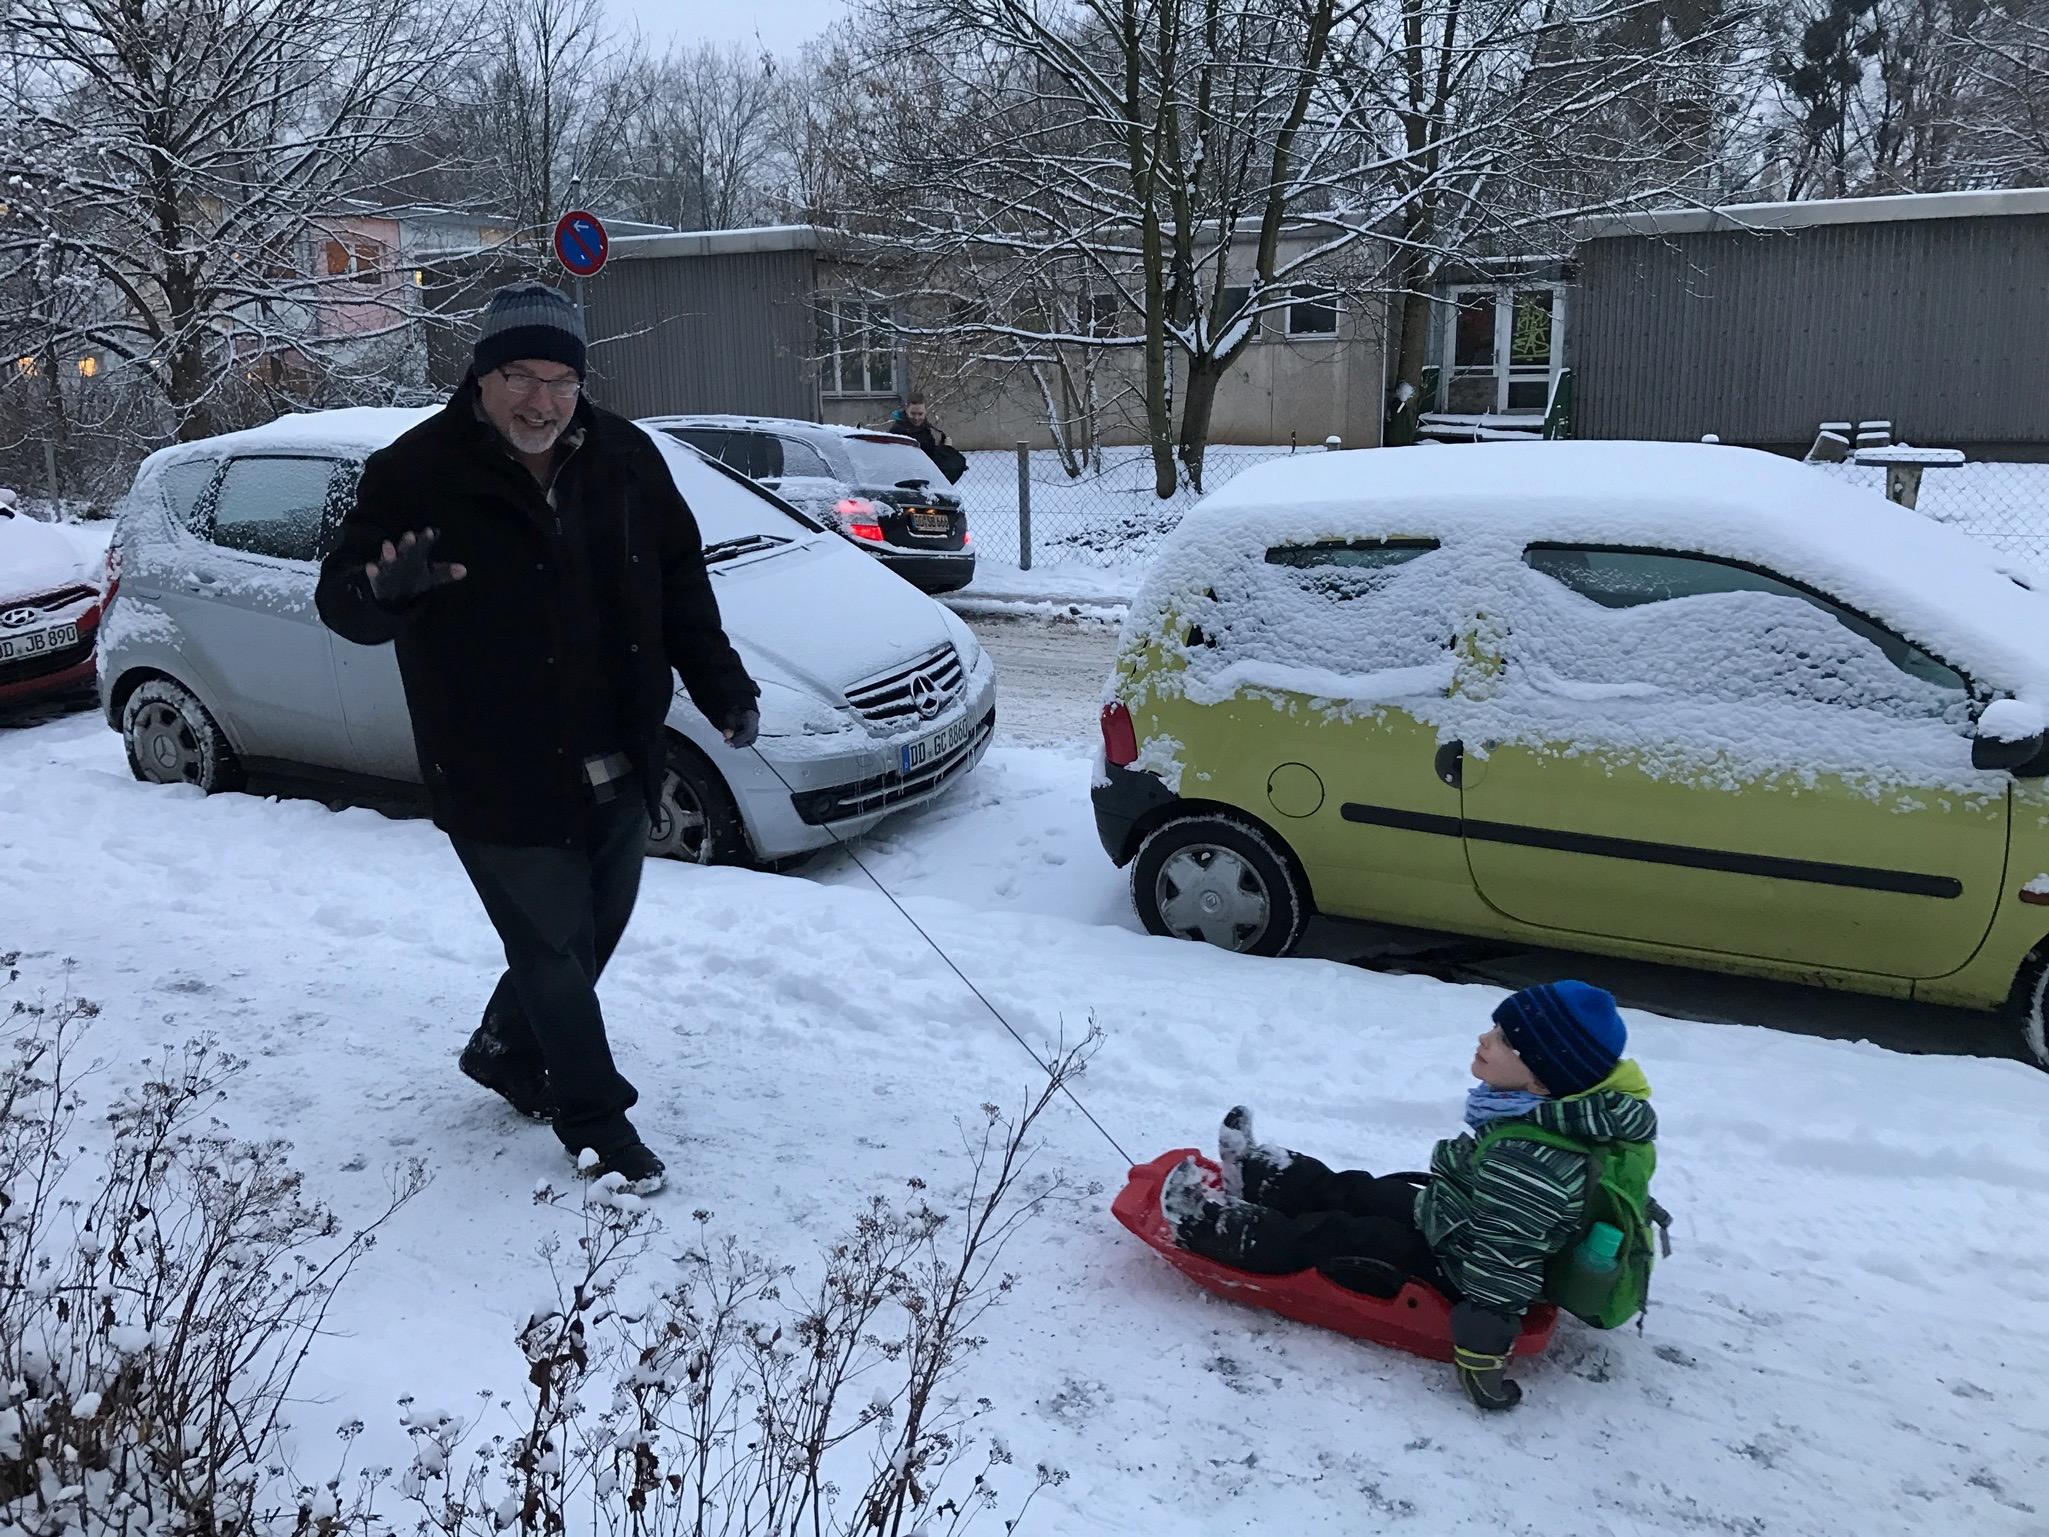 Papa Rocco bringing Ollie to school.